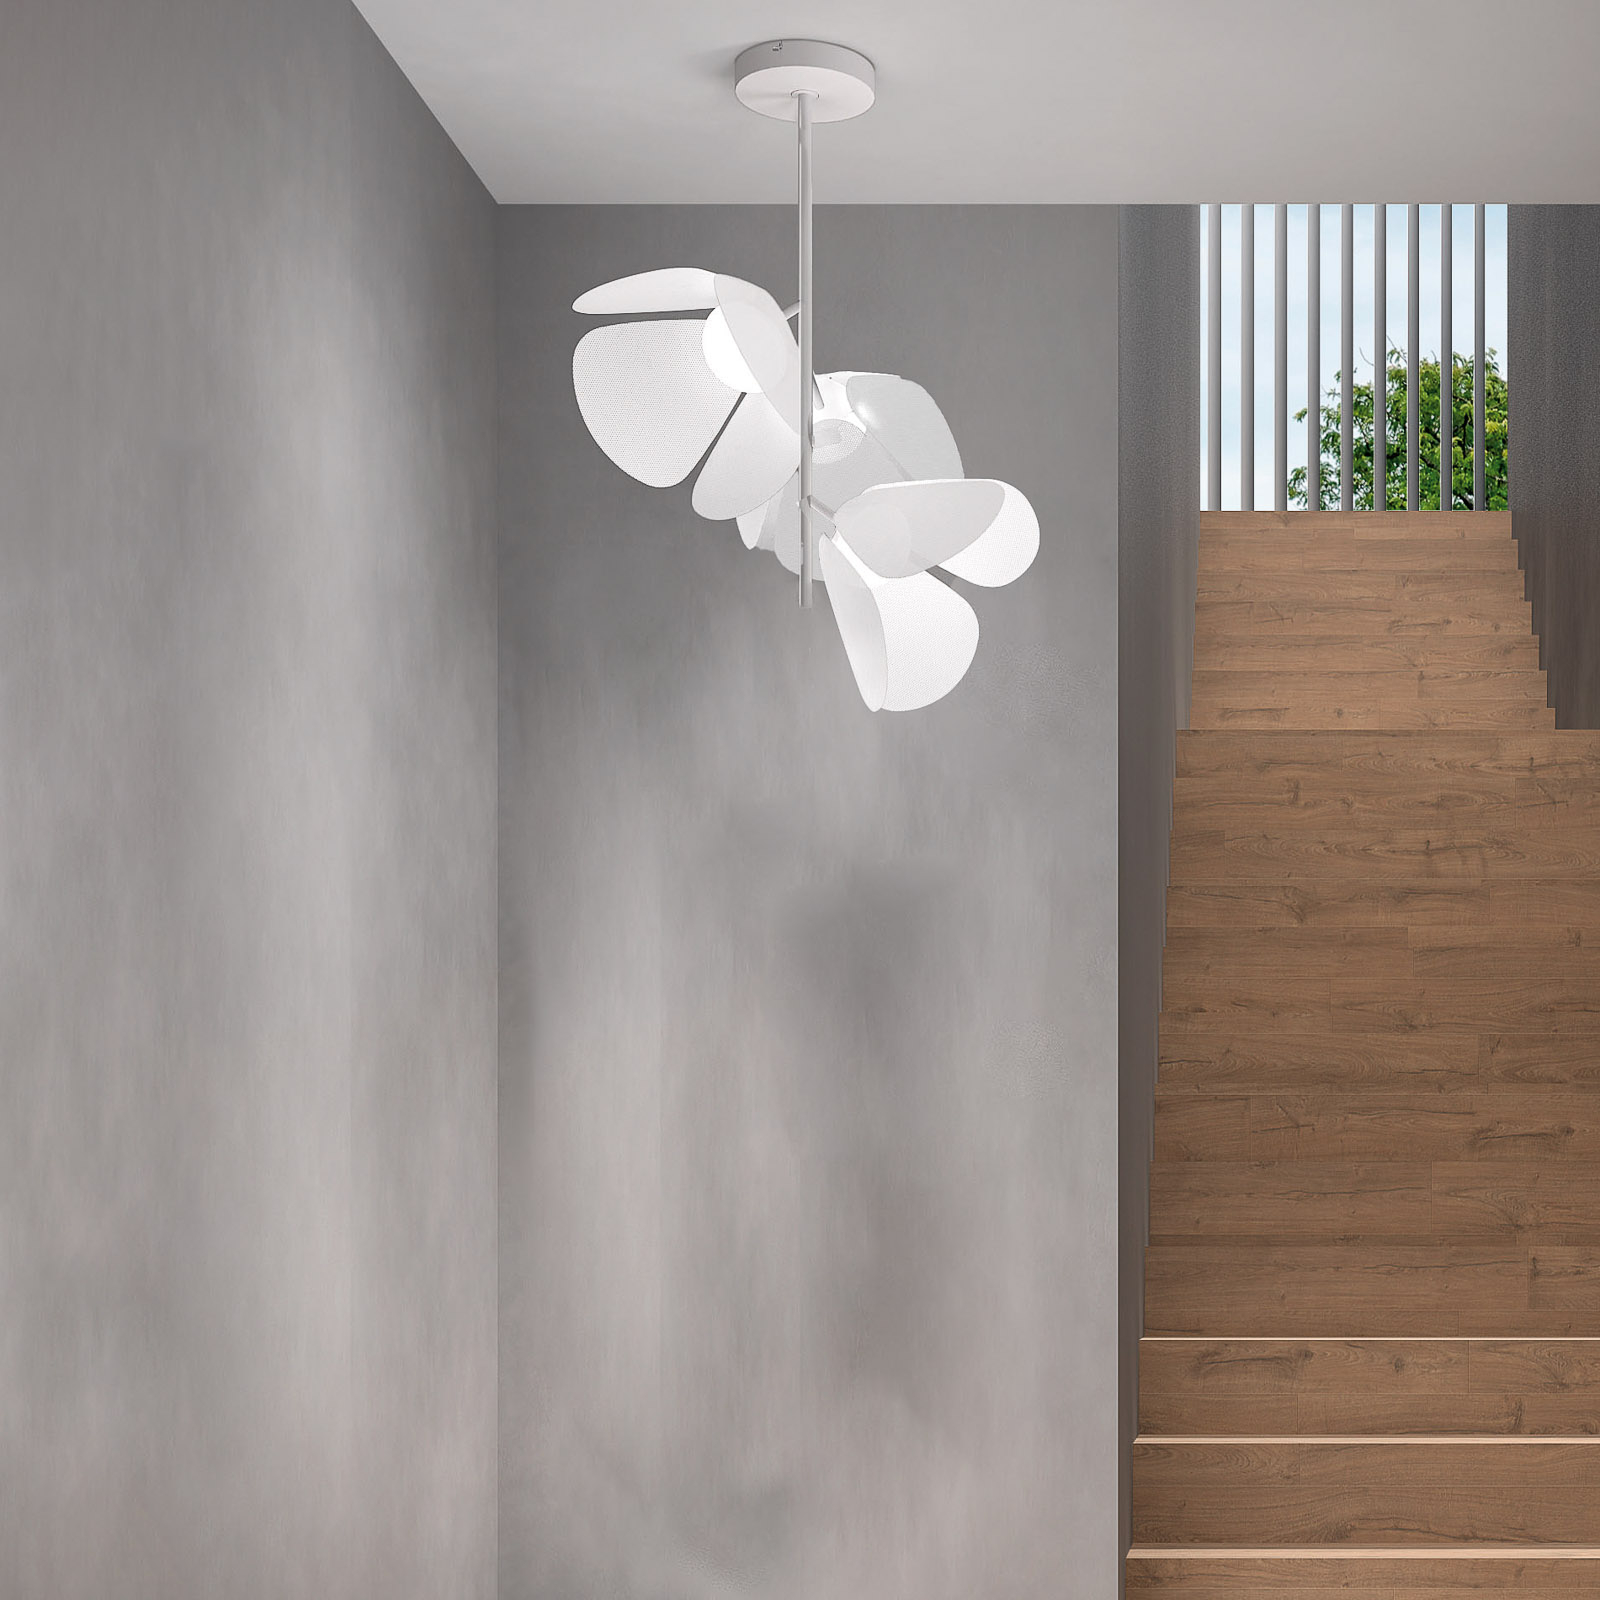 Bover Mod PF/73/3L plafonnier LED, blanc